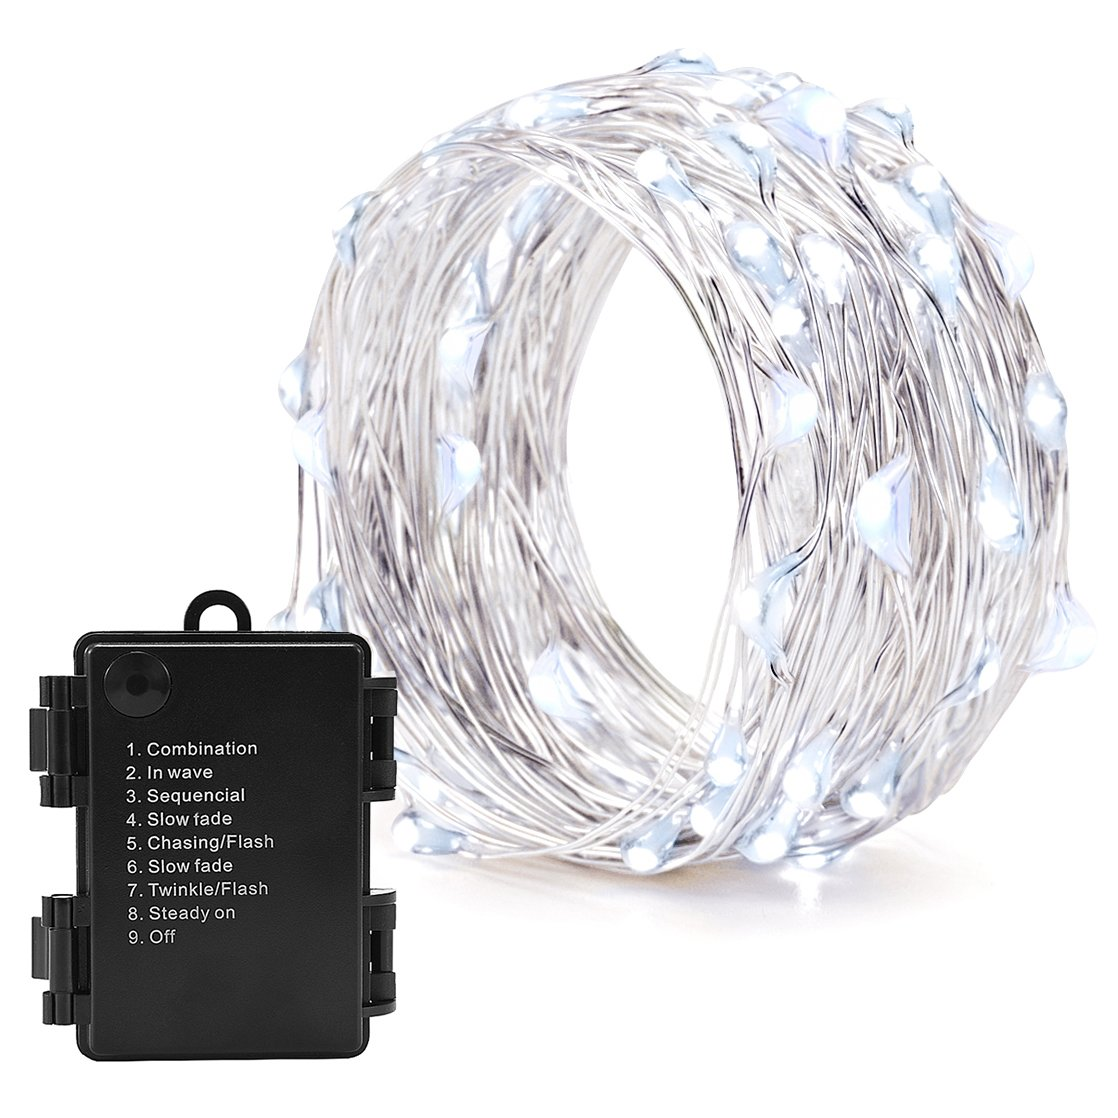 30er Micro LED Lichterkette Batterie-betrieben Kaltweiss 3M draht ...